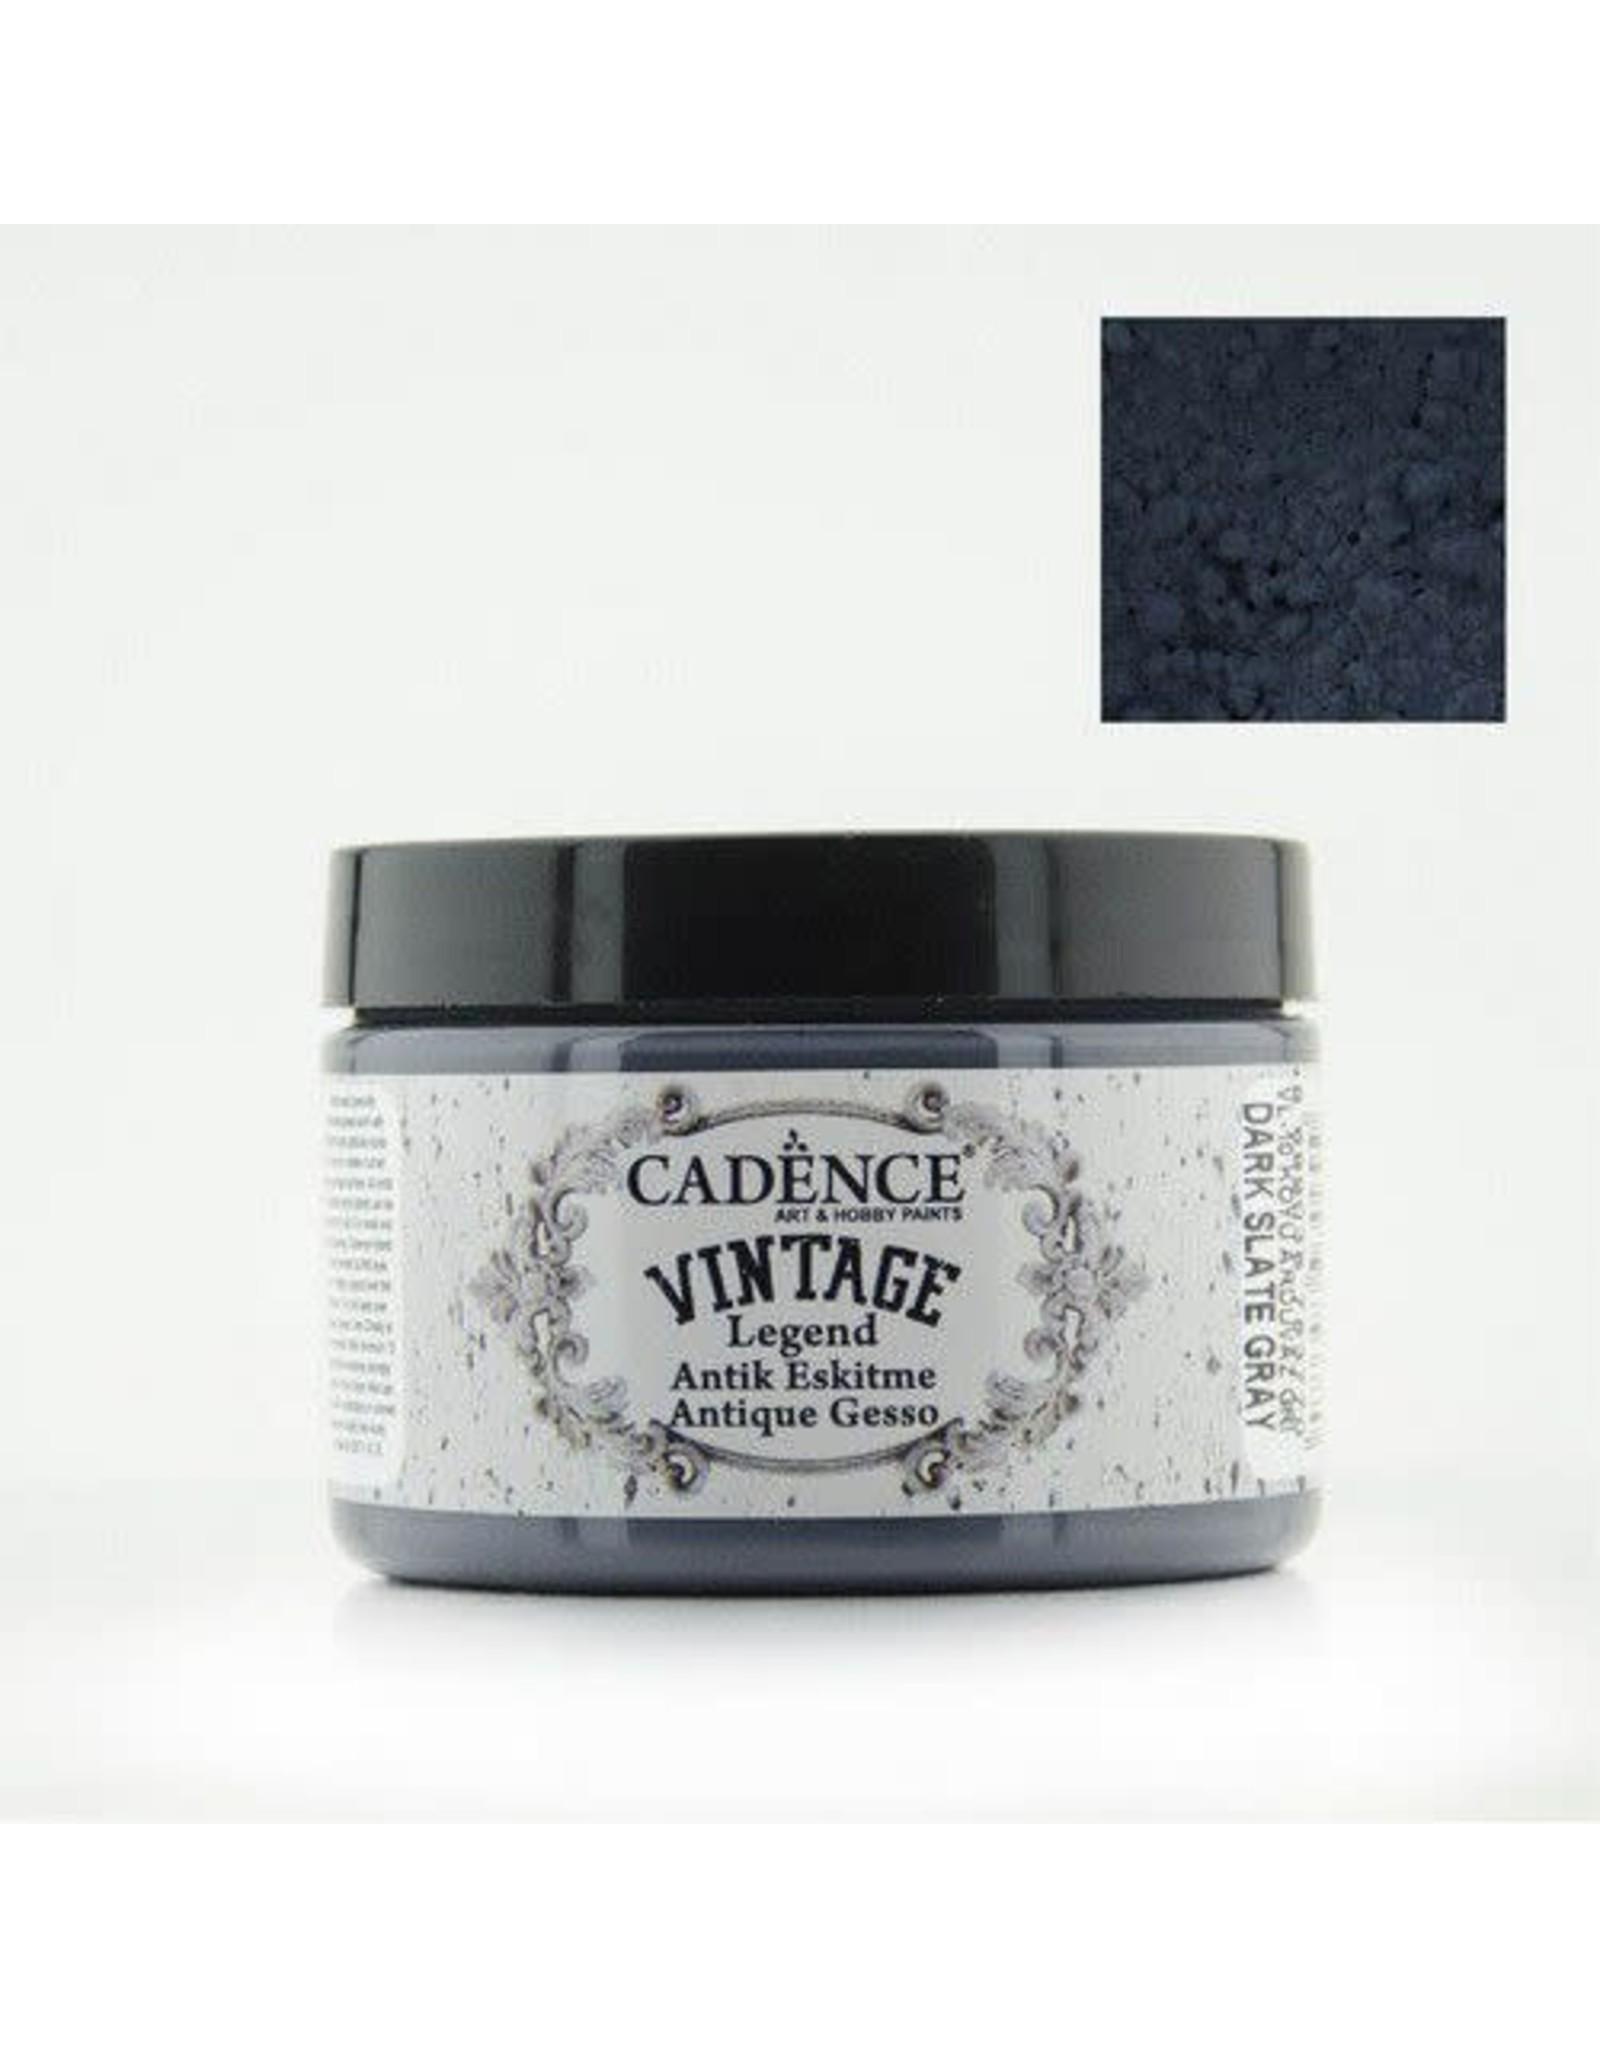 Cadence Cadence Vintage Legend gesso Dark Slate - grijs 150 ml